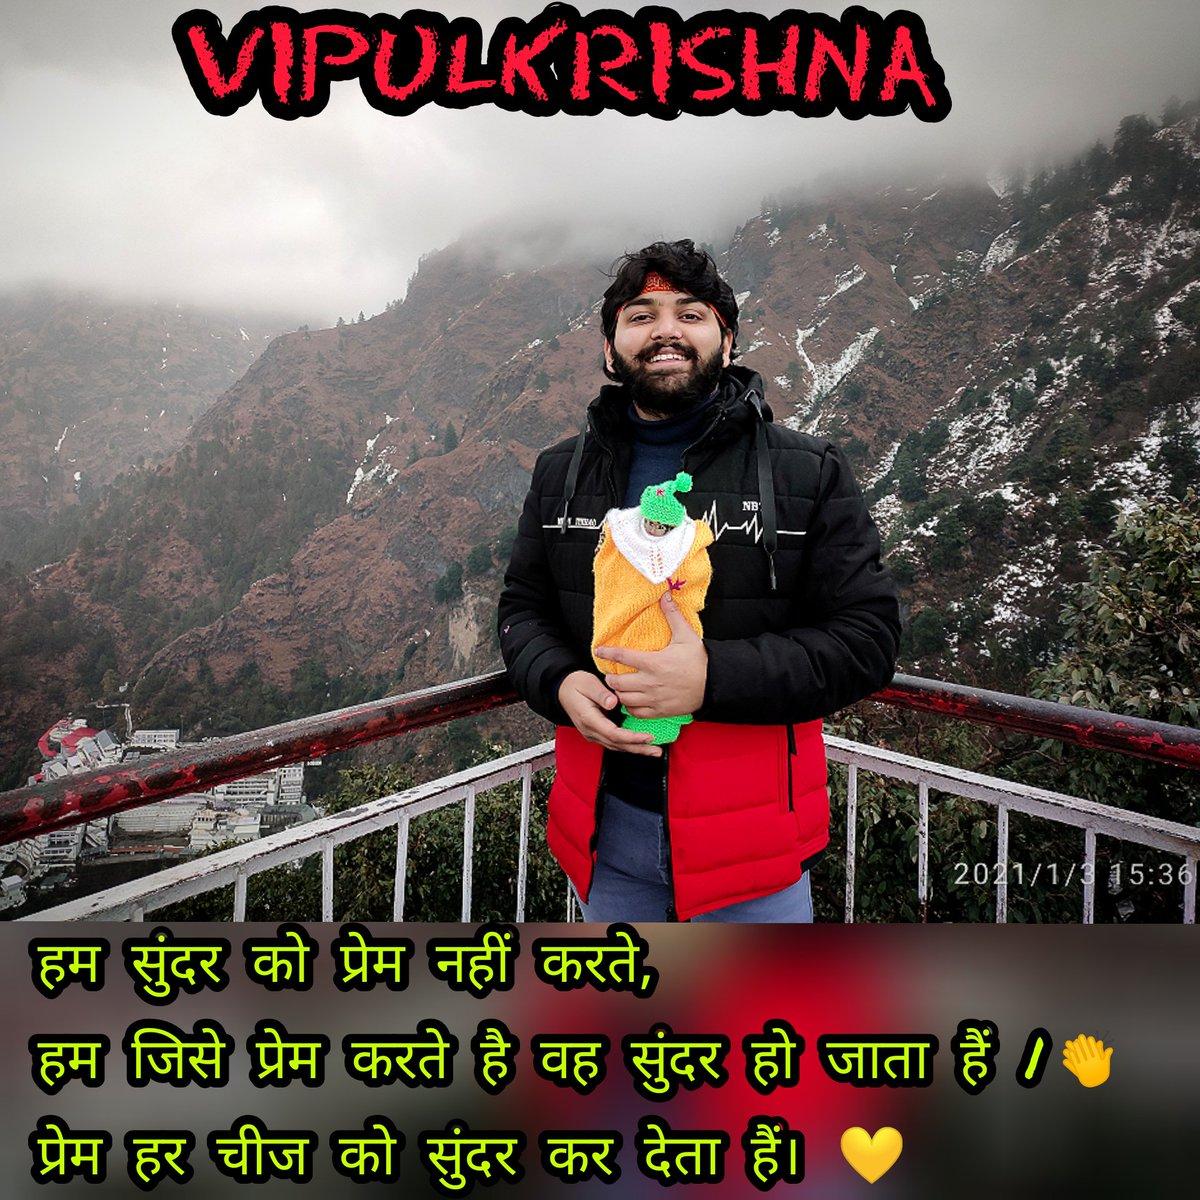 #love is #beautiful  #विपुलकृष्णा #vipulkrishna #vk #VIPULKRISHNAVK  #My #Life #Mah  #Experience #storyofmylife